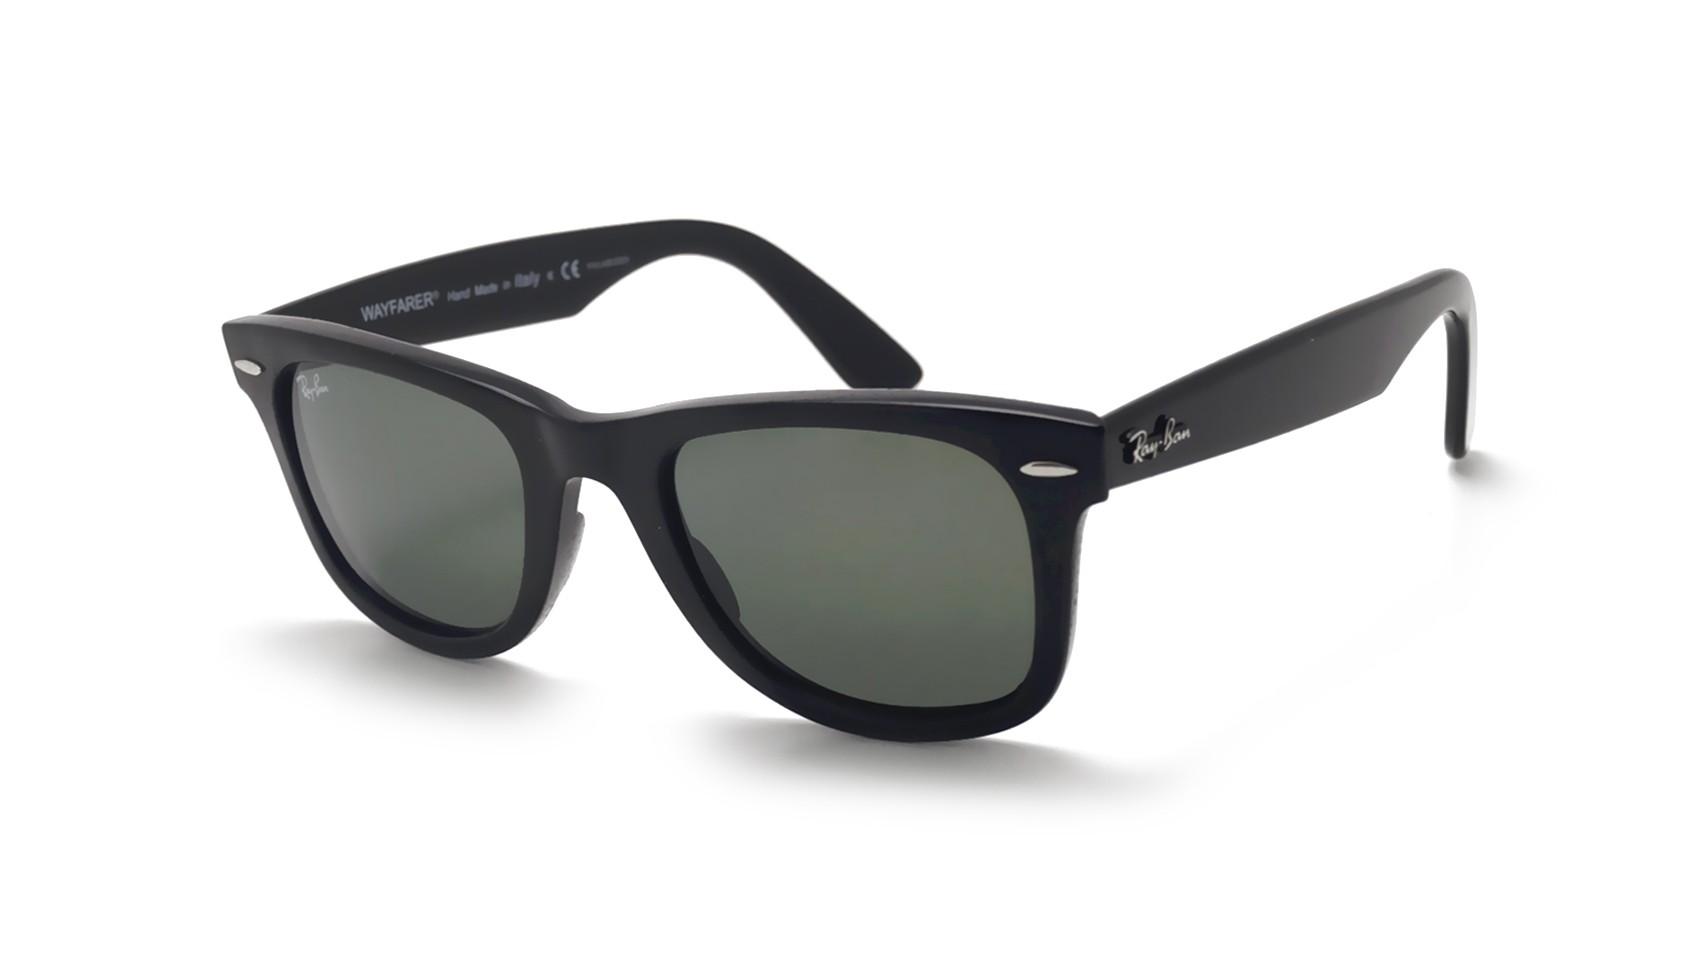 b8377ae67f Sunglasses Ray-Ban Wayfarer Ease Black G-15 RB4340 601 50-22 Medium